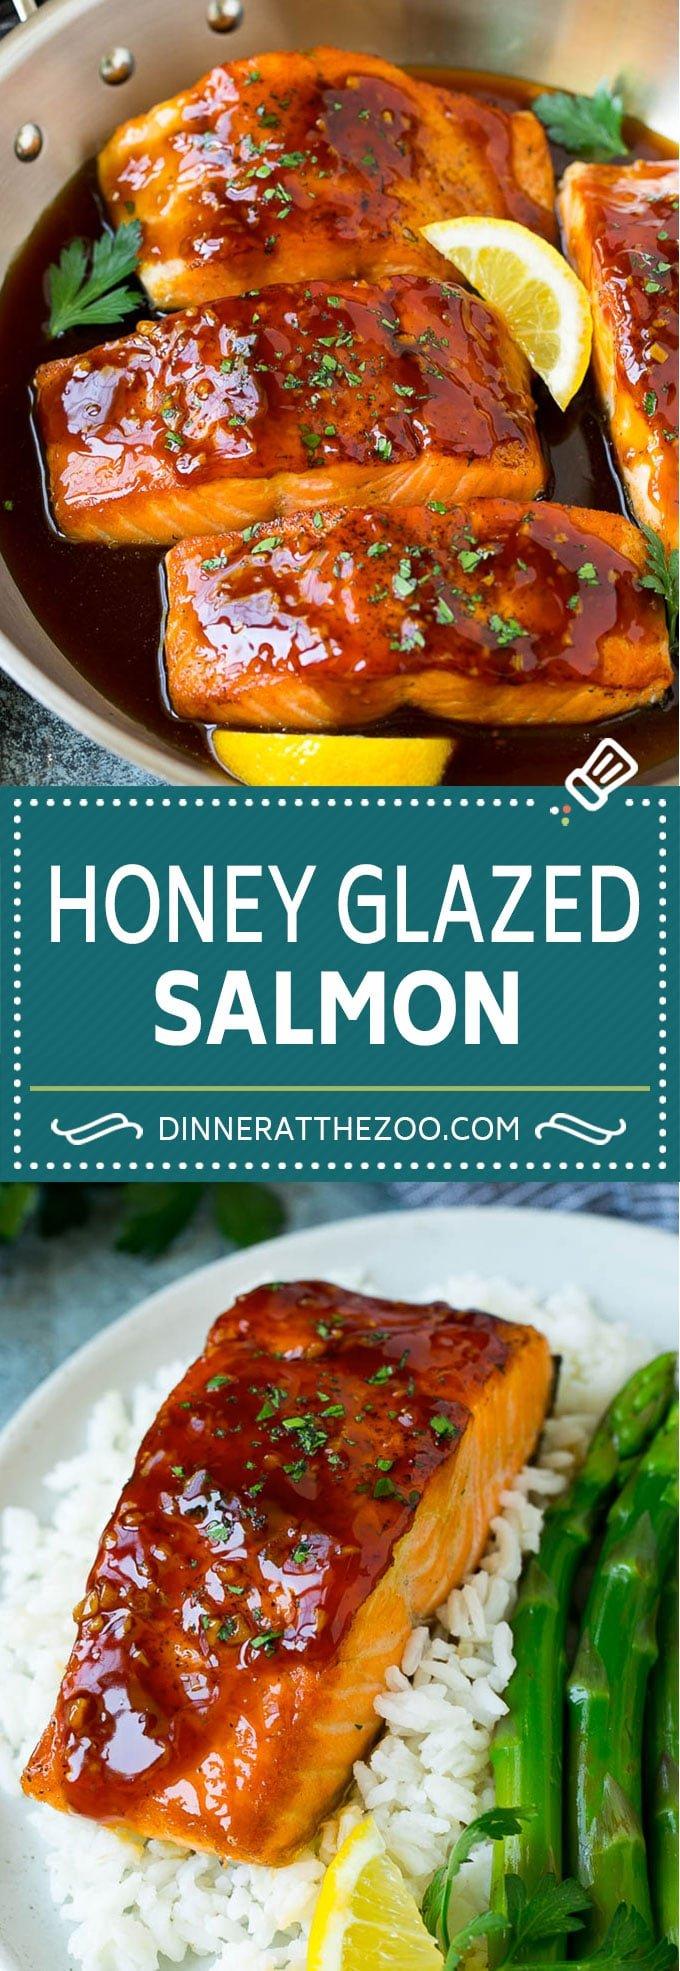 Honey Glazed Salmon Recipe | Seared Salmon #salmon #honey #dinner #fish #garlic #dinneratthezoo